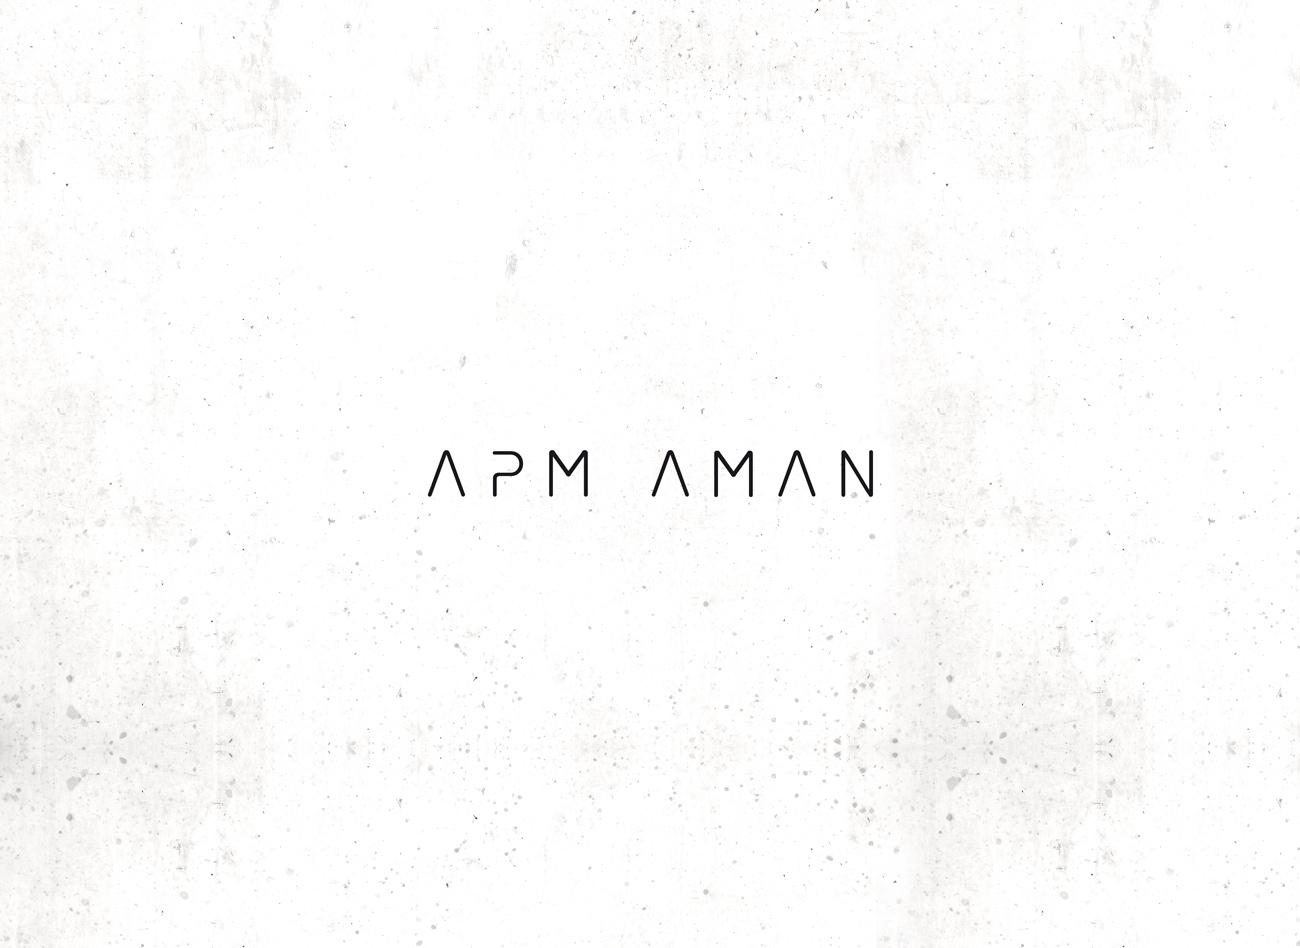 Logogestaltung / APM AMAN